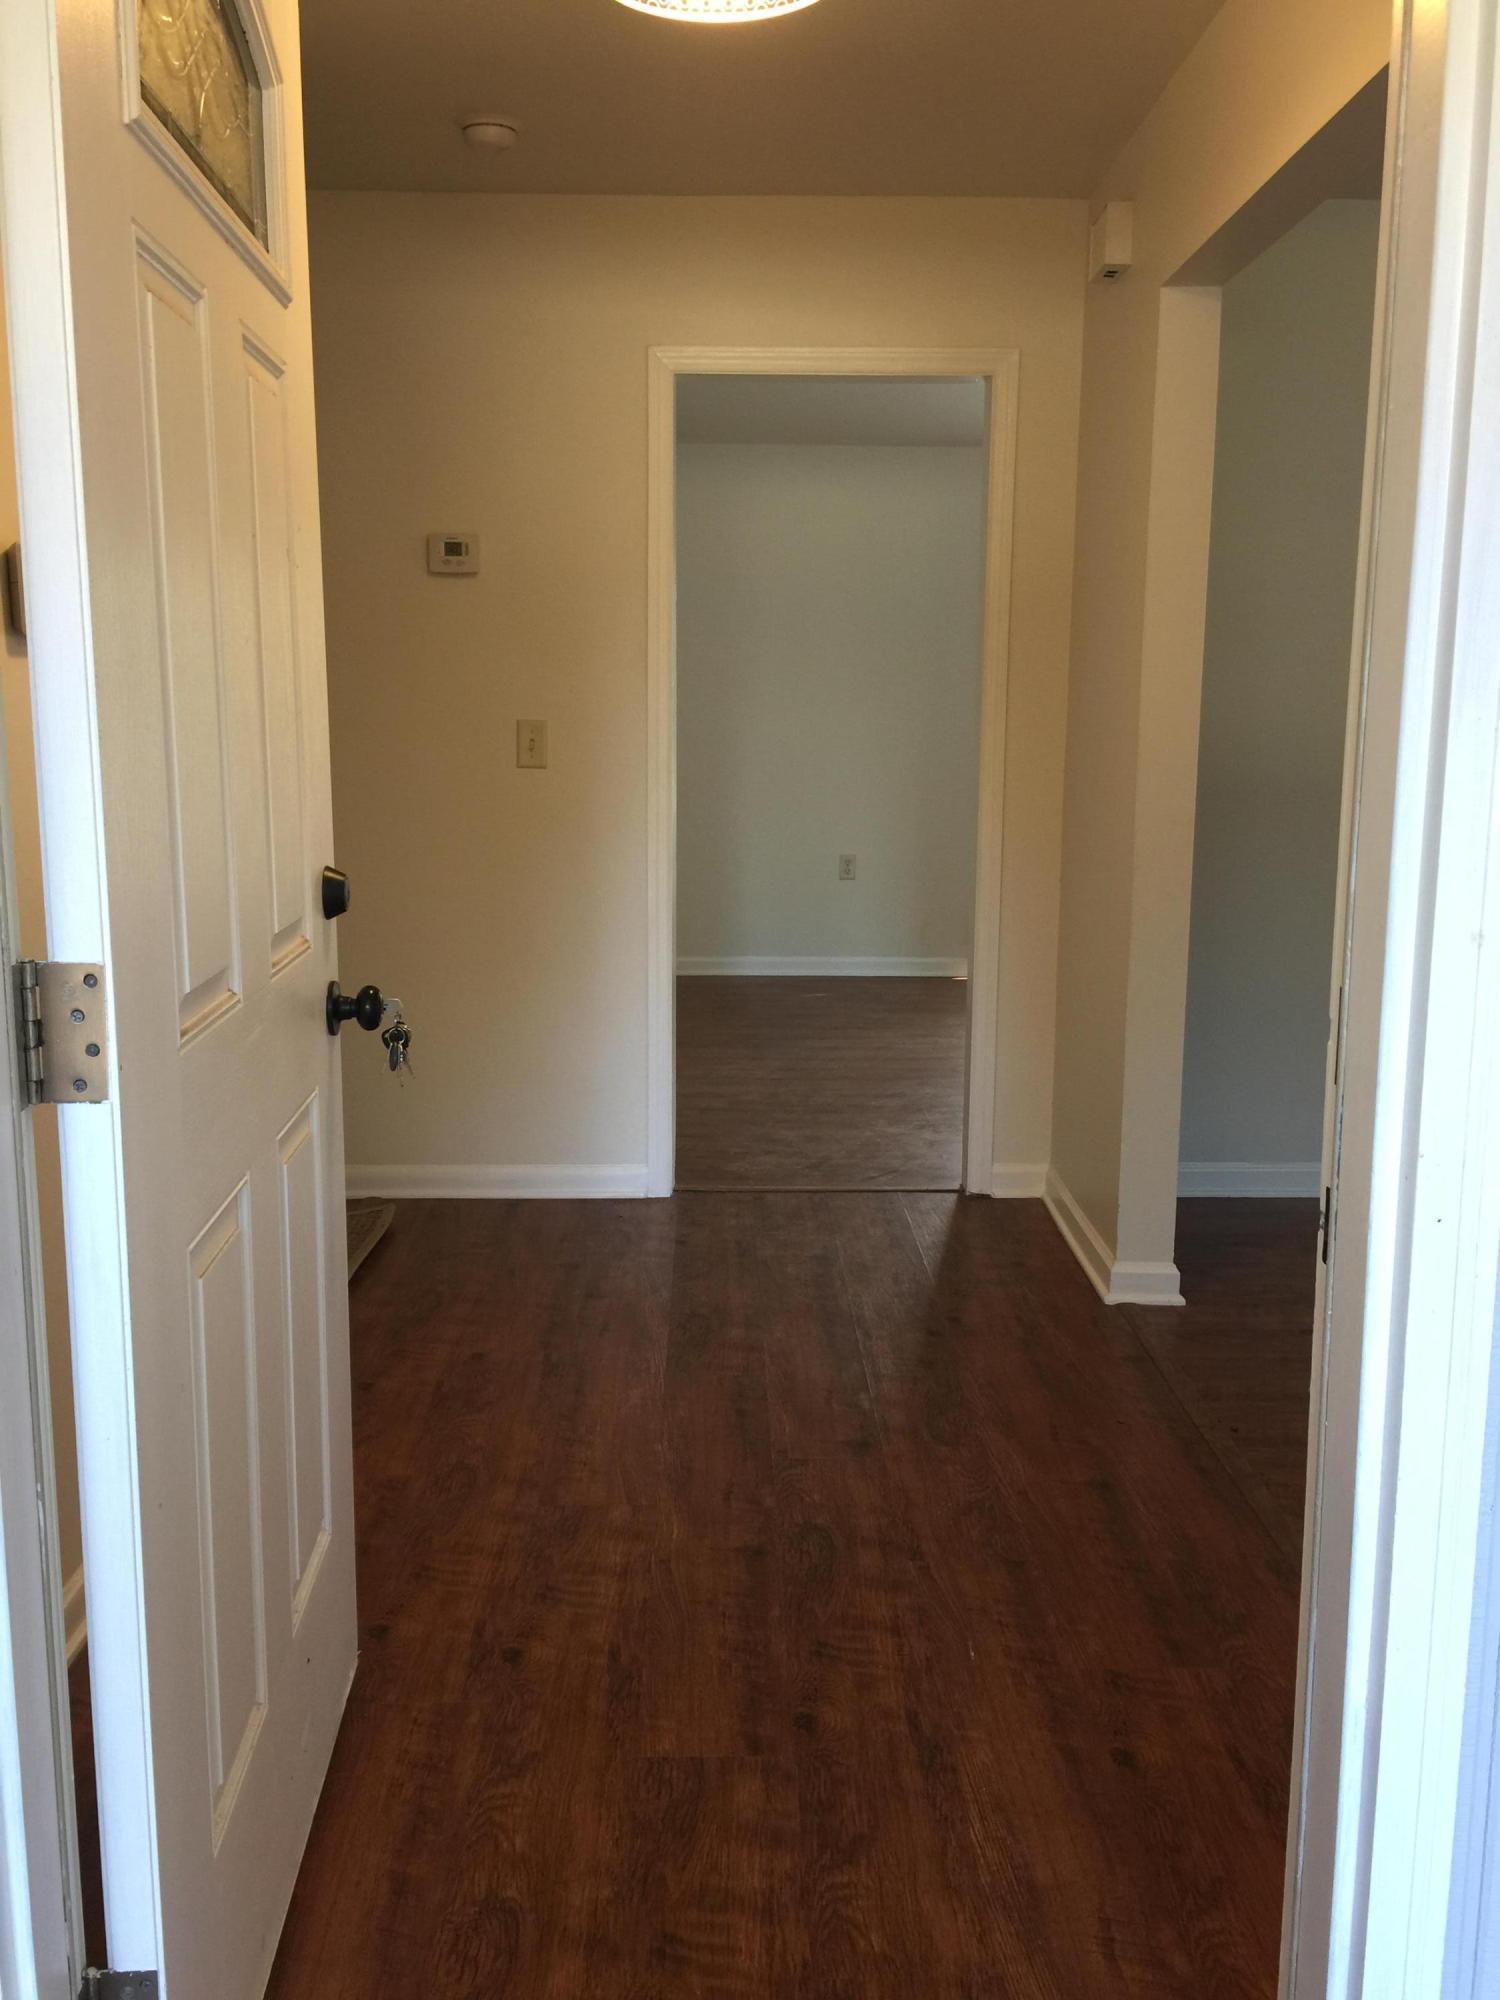 Quail Run Homes For Sale - 1202 Chicorie, Charleston, SC - 2